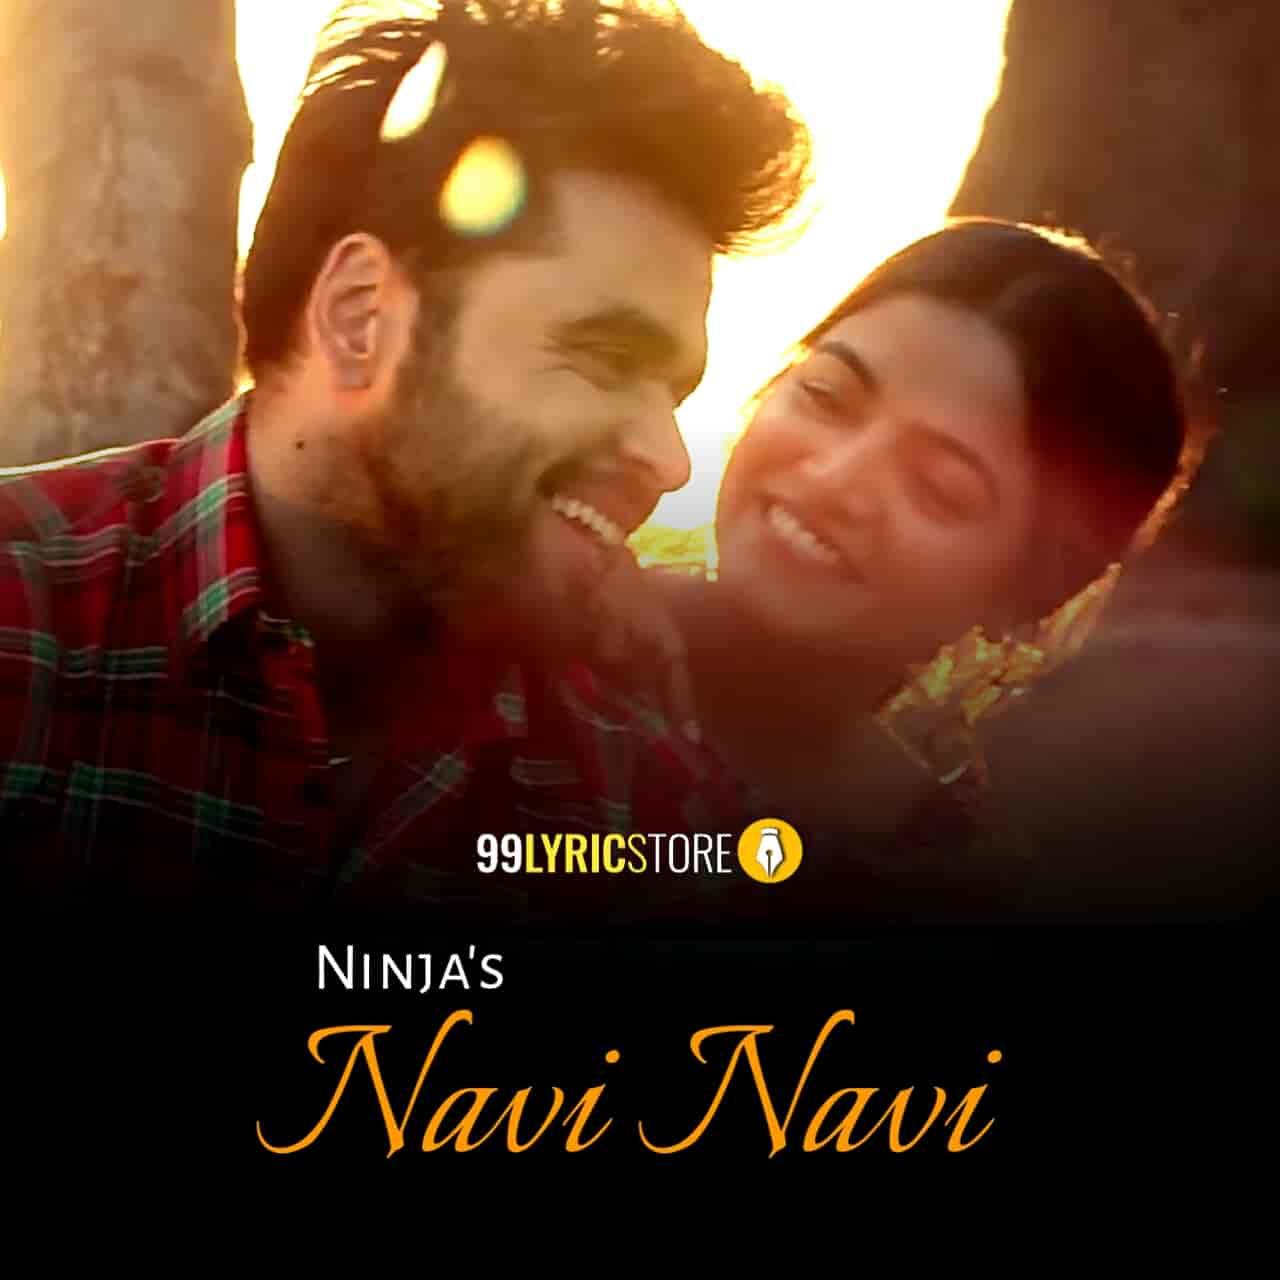 Navi navi punjabi song sung by Ninja